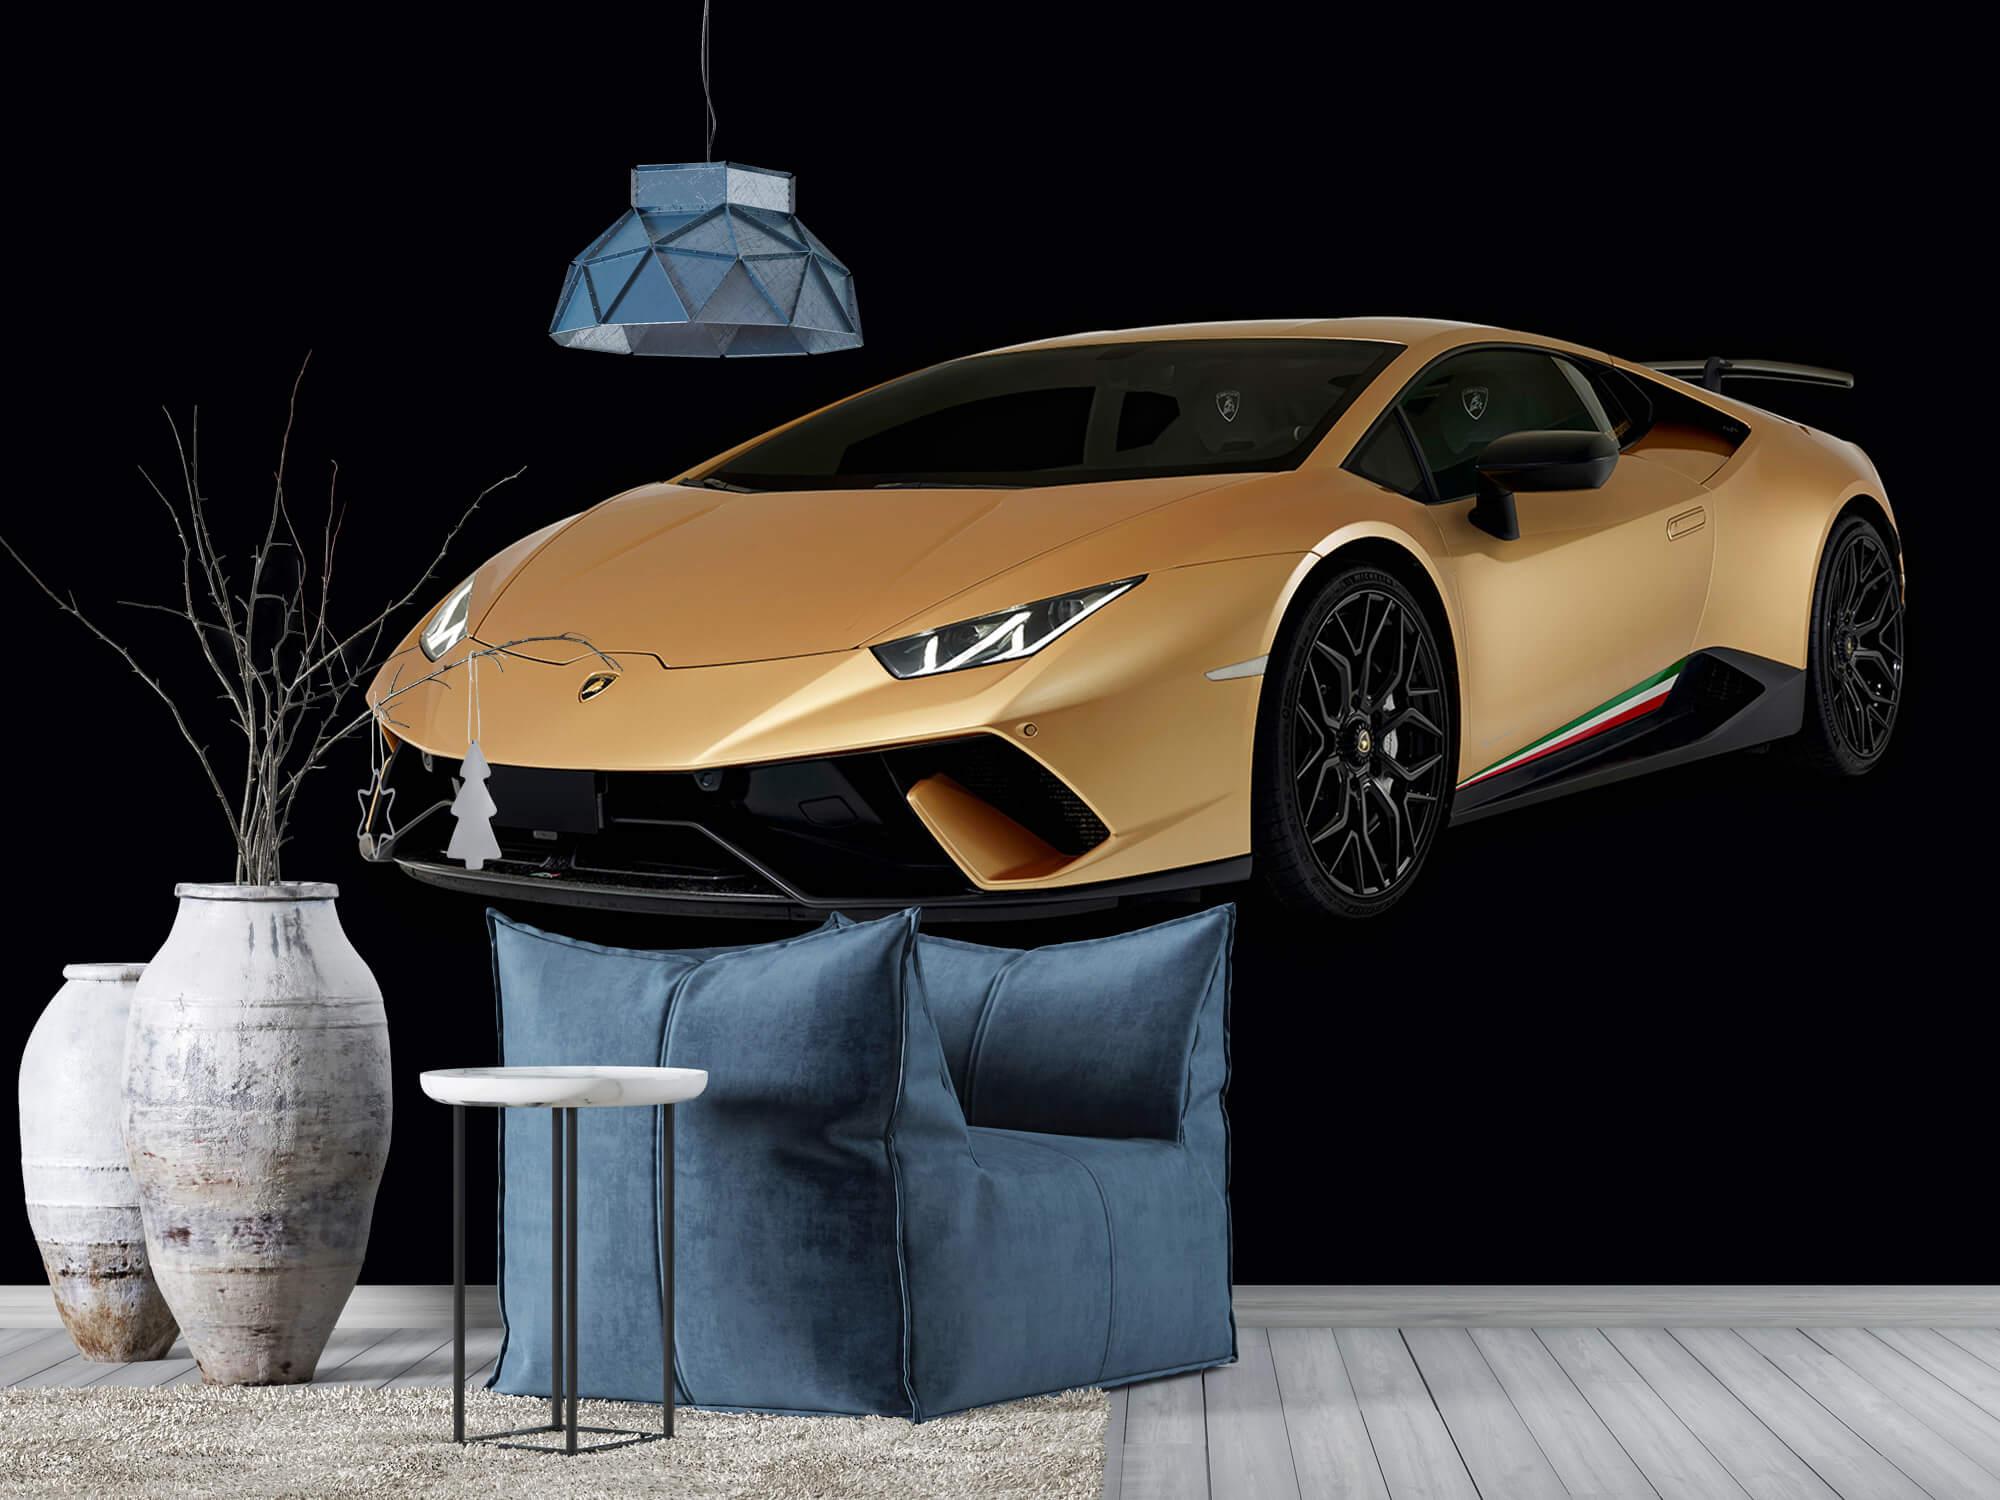 Wallpaper Lamborghini Huracán - Avant droit, noir 10